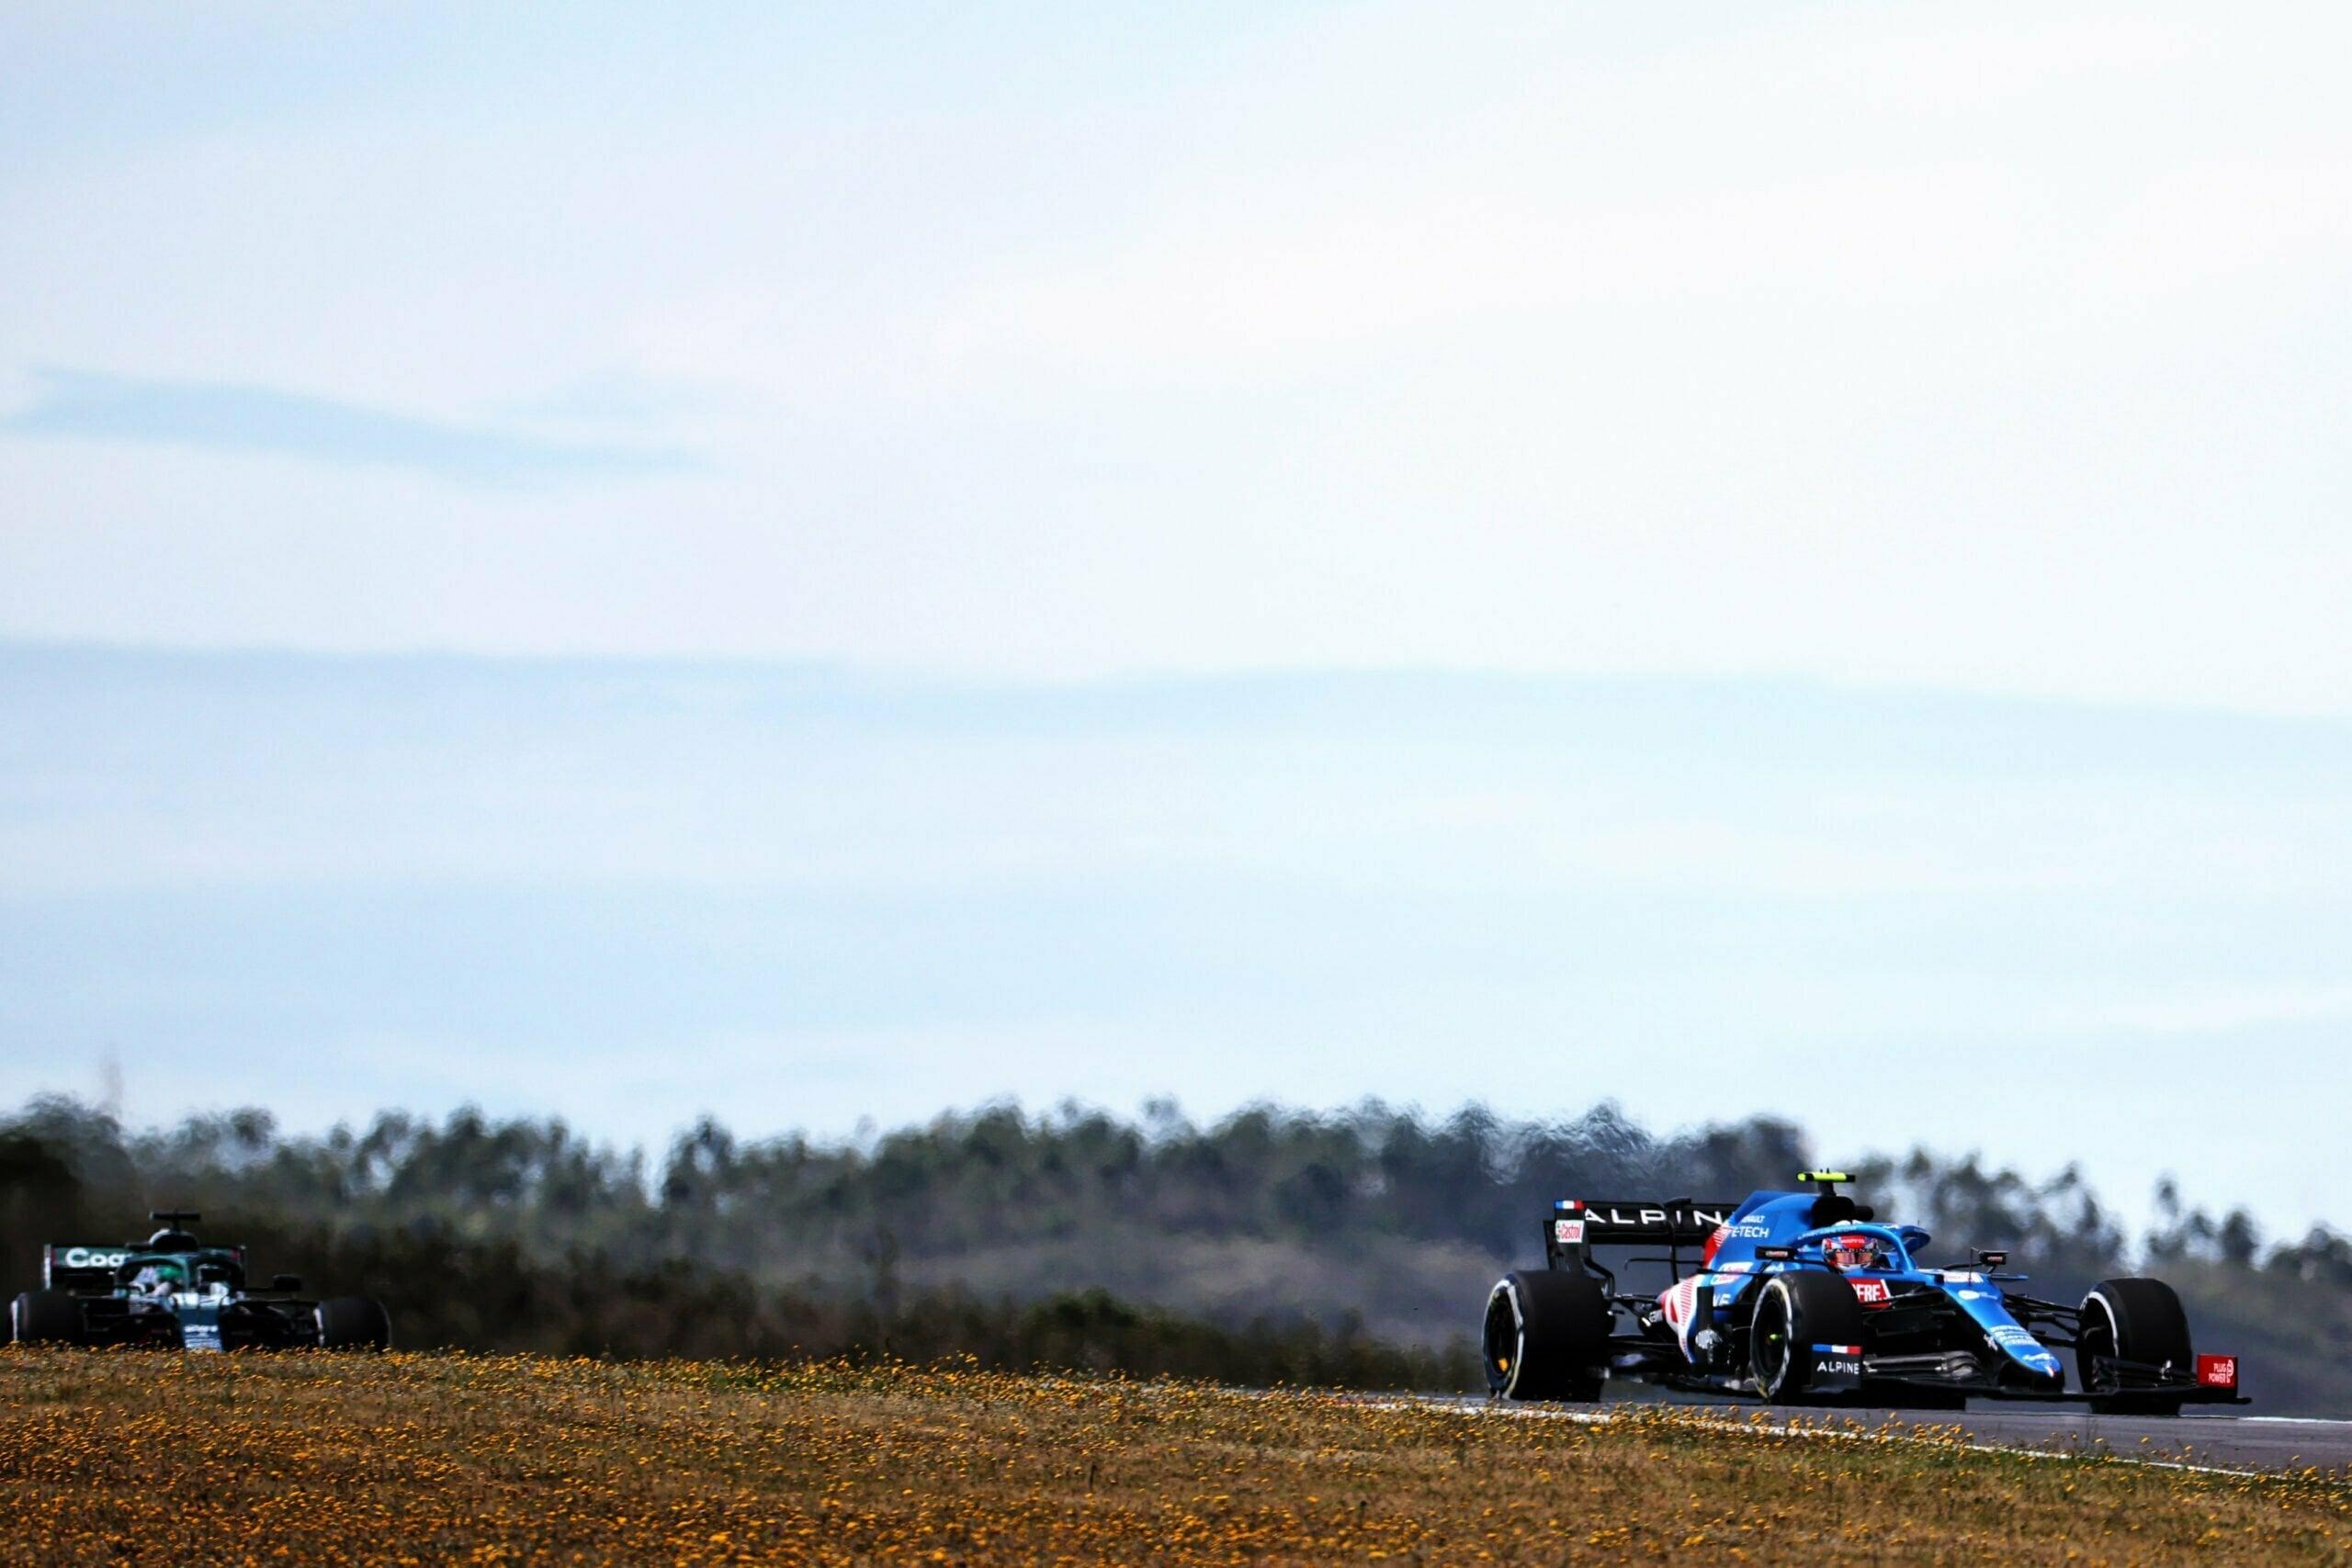 Alpine F1 Team GRAND PRIX HEINEKEN DU PORTUGAL Alonso Ocon 2021 A521 16 scaled   Alpine F1 Team : des essais convaincants au Grand Prix Heineken du Portugal